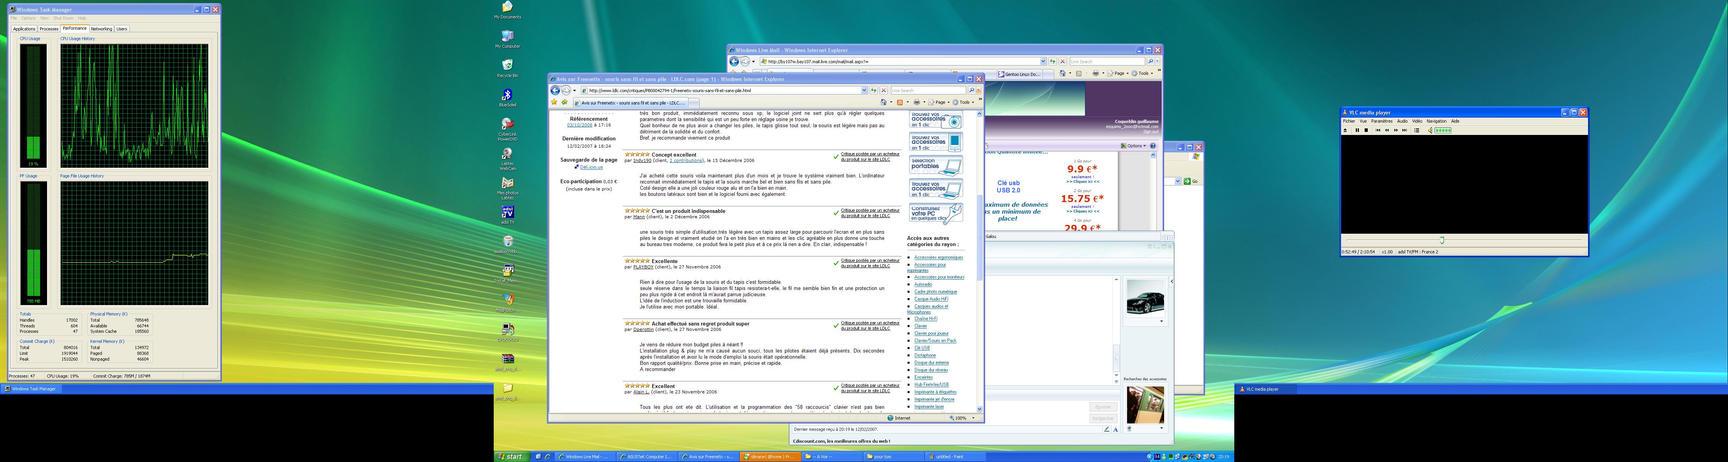 tridesktop by esquimogenerik